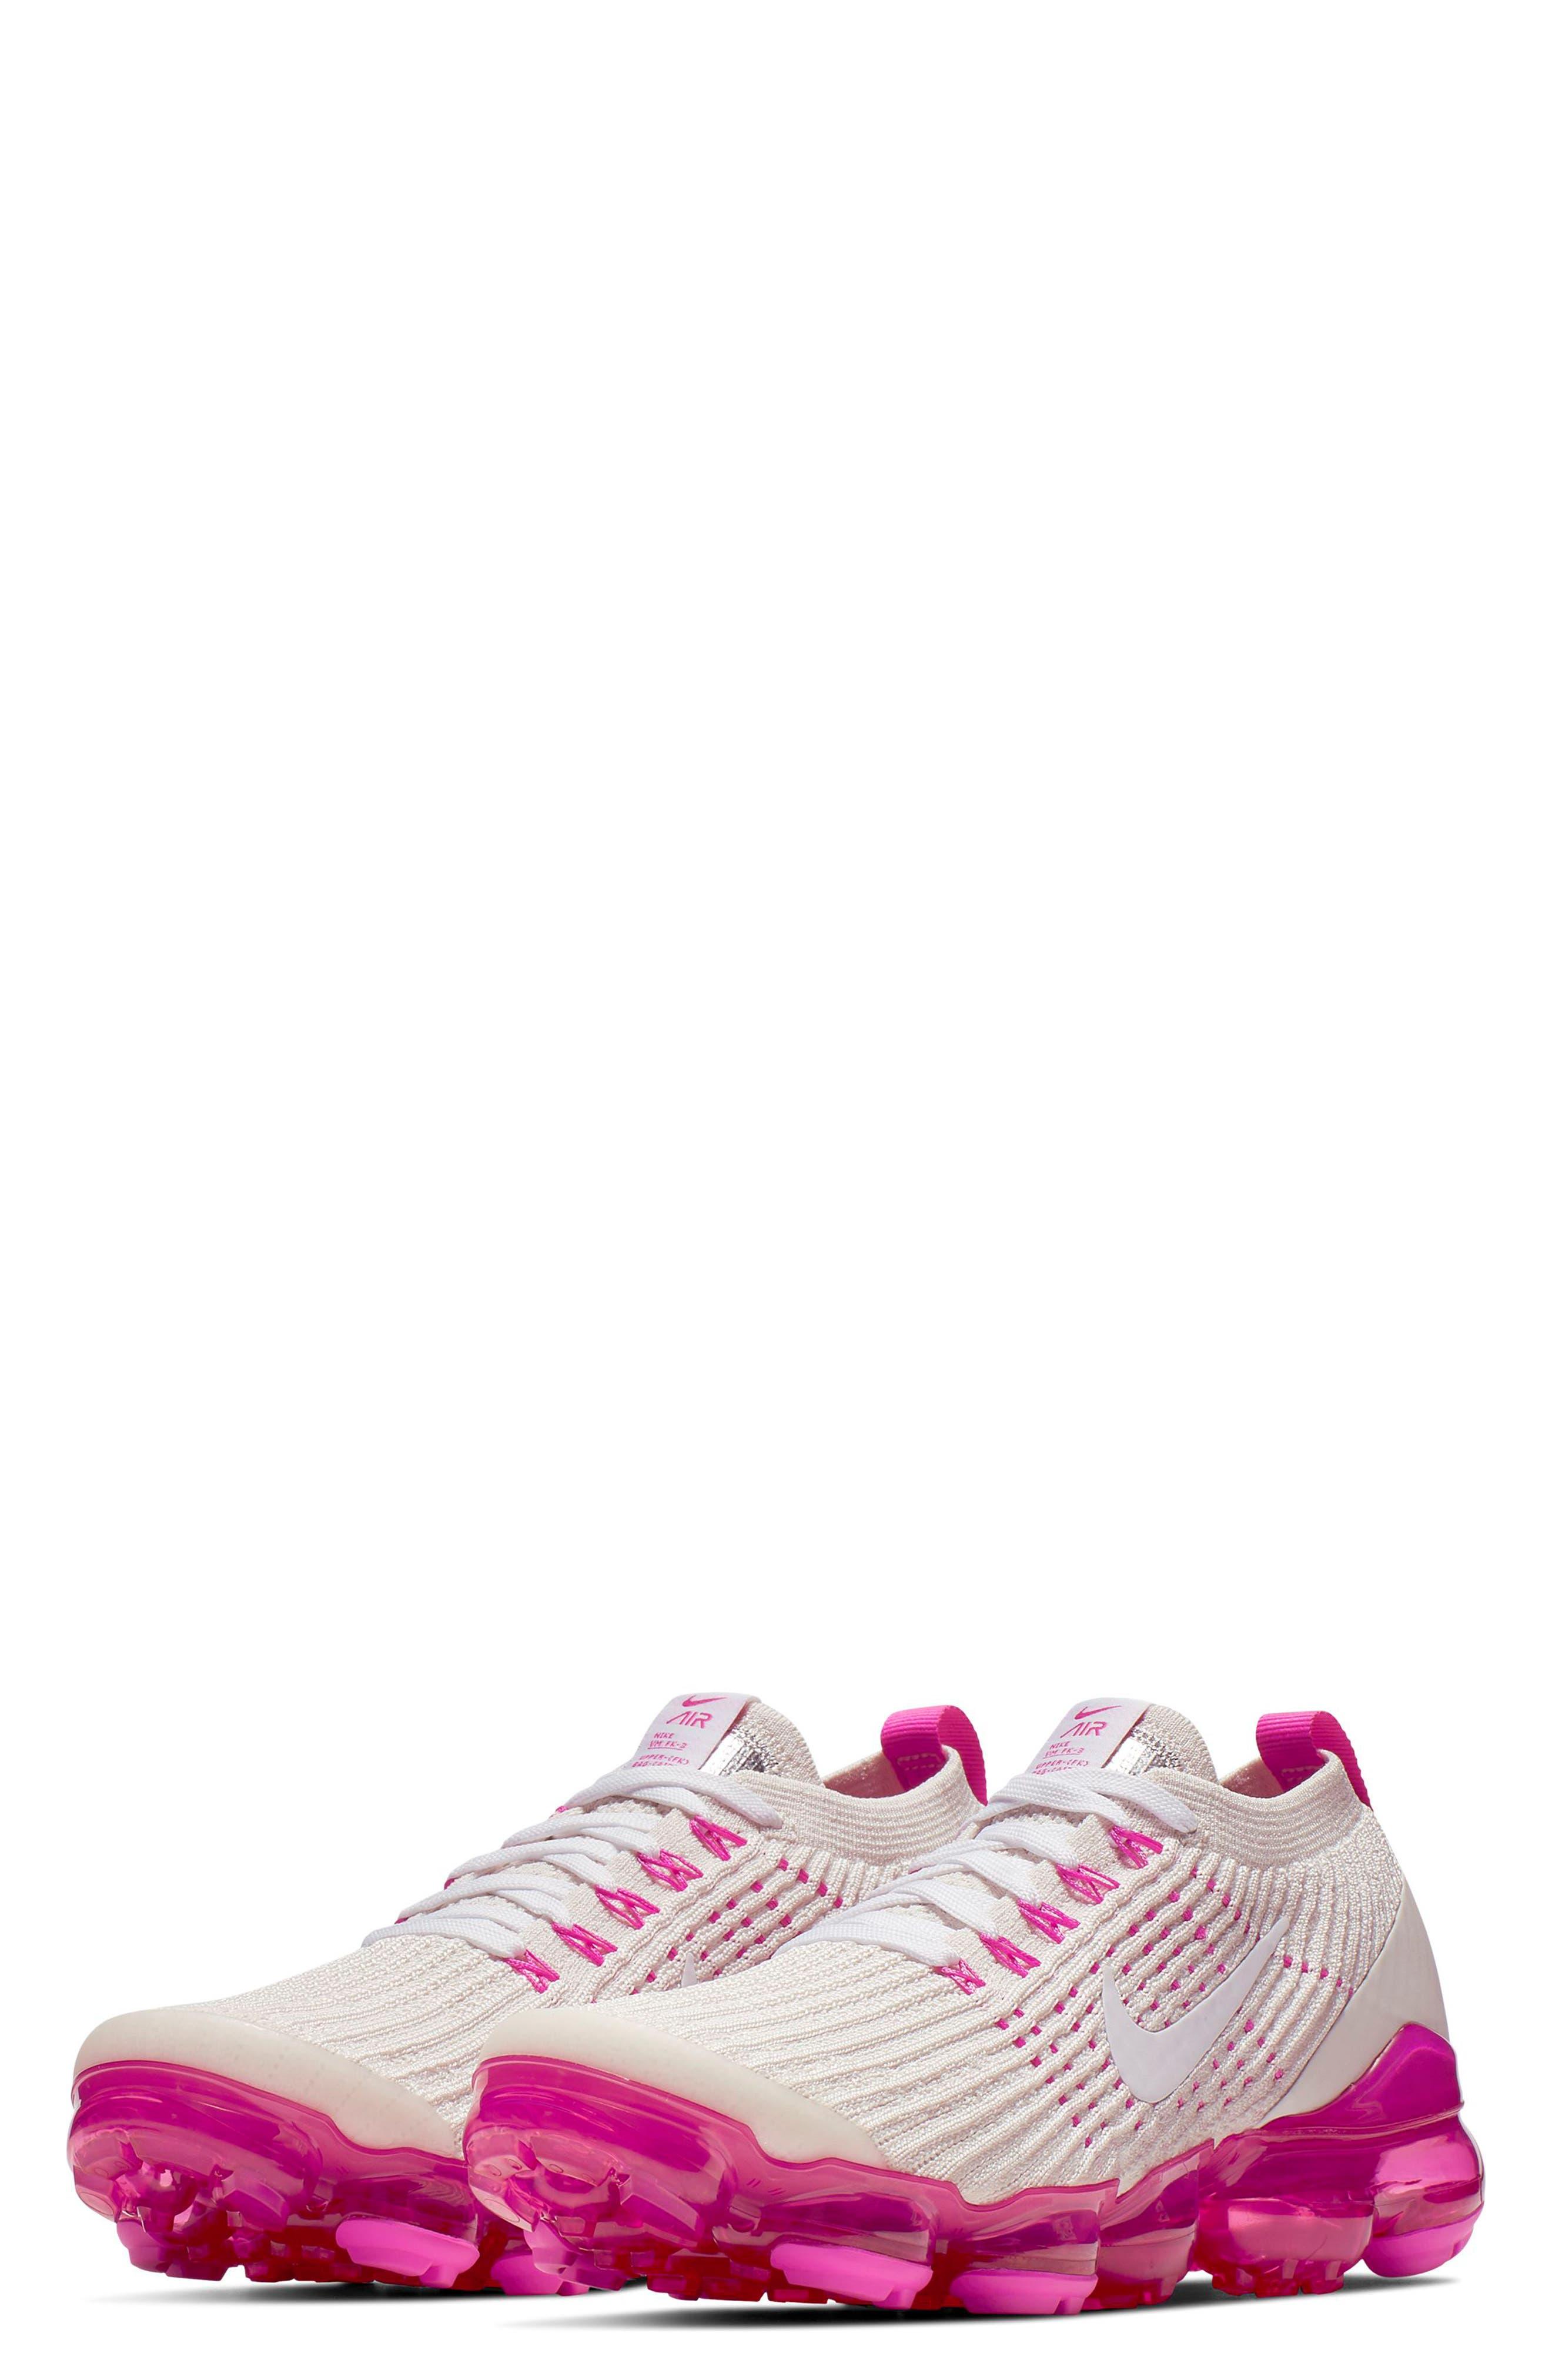 NIKE, Air VaporMax Flyknit 3 Running Shoe, Main thumbnail 1, color, PHANTOM/ WHITE/ FUCHSIA/ PINK